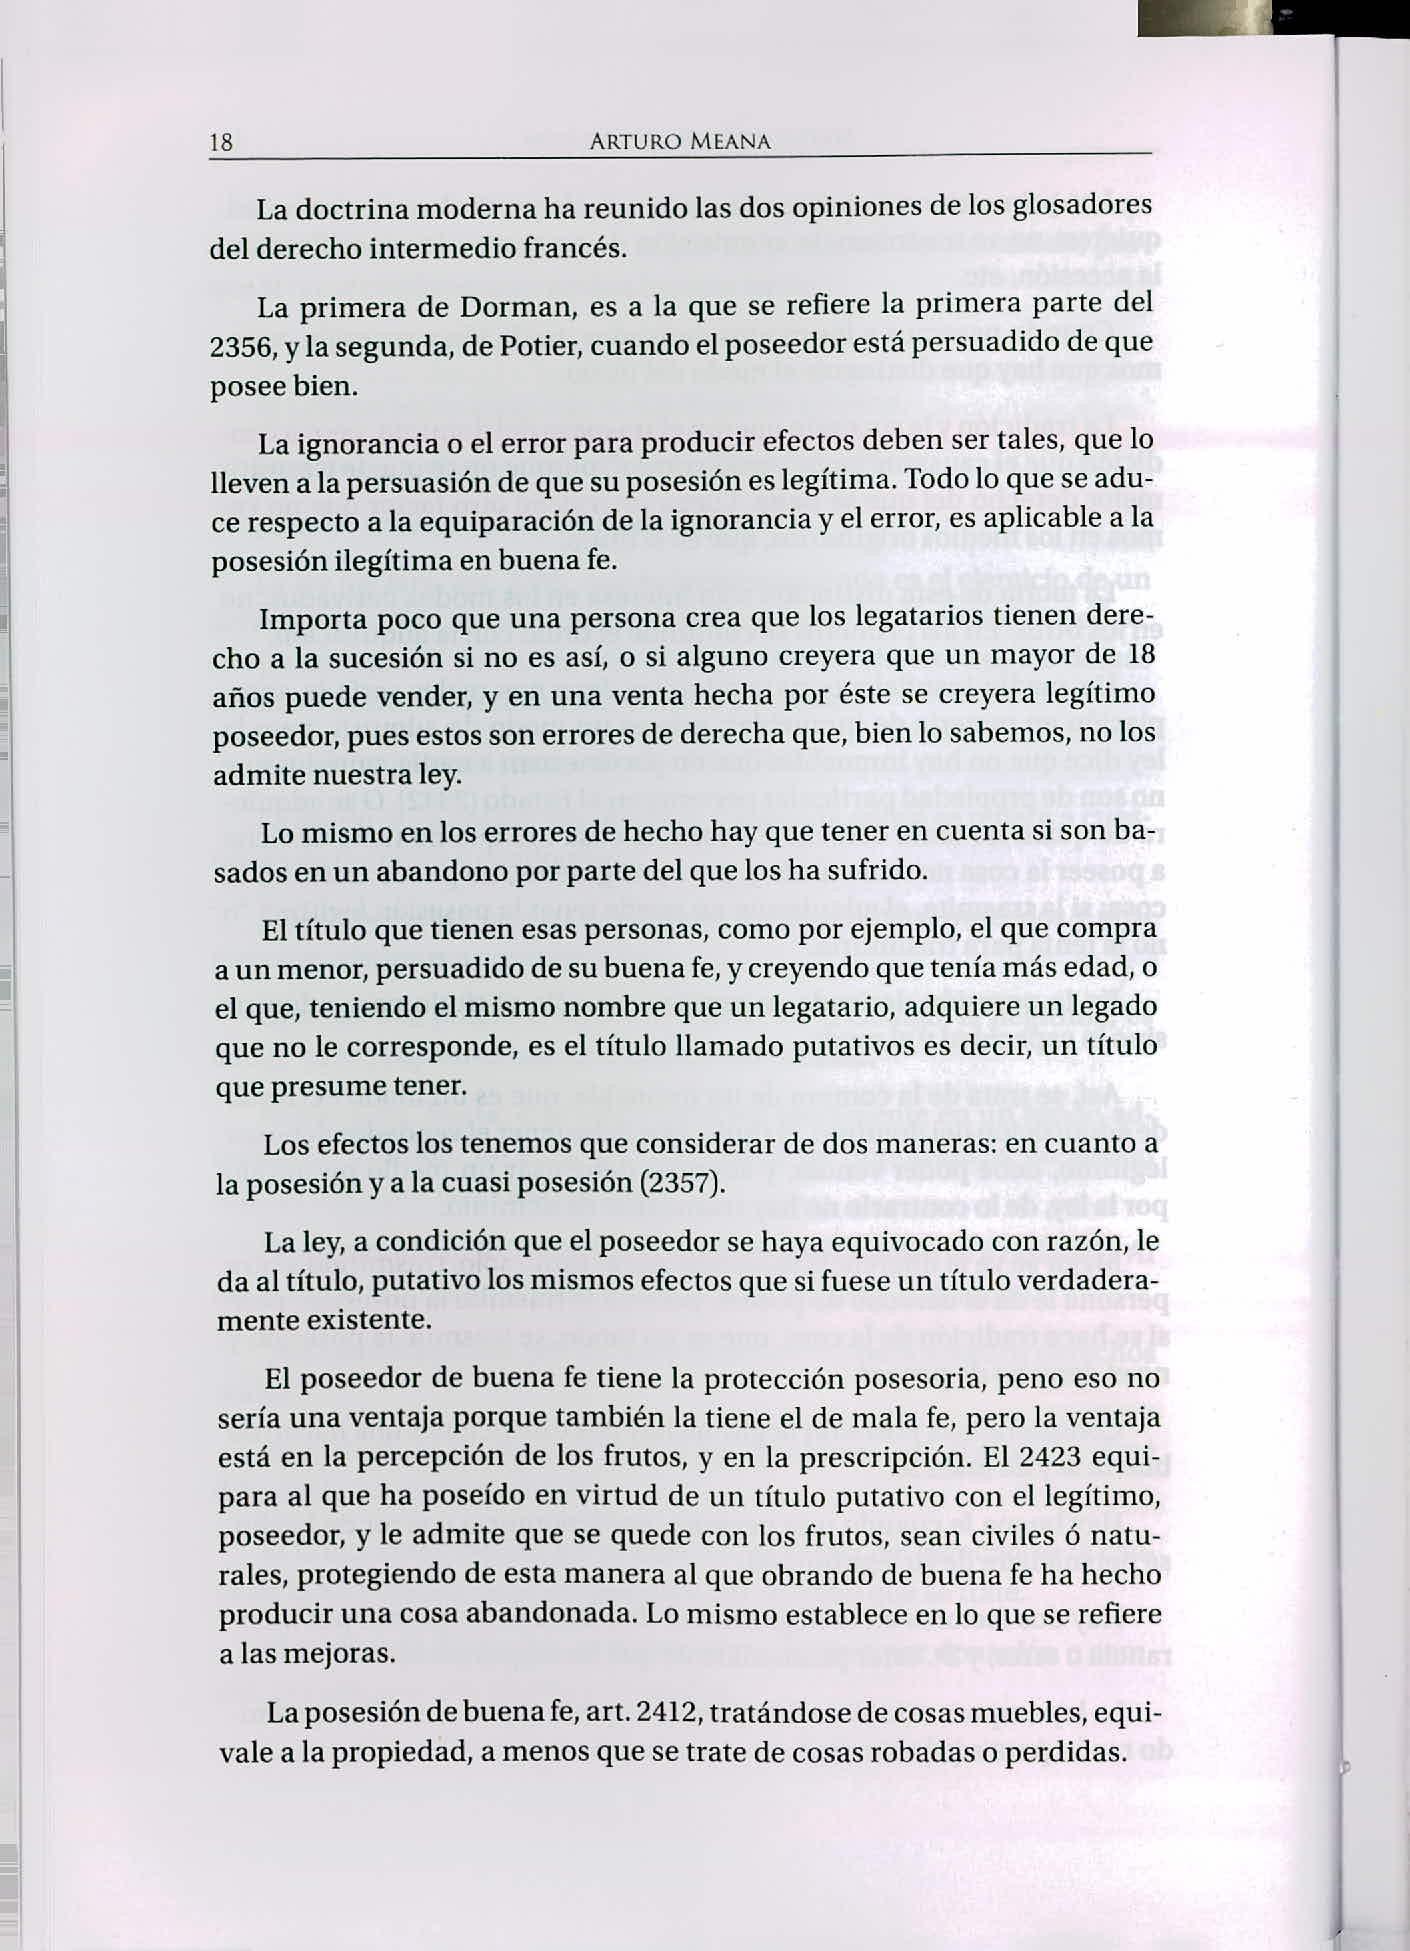 Index Of Greenstone Collect Salagr Index Assoc Hash0140 Dir # Le Font Muebles